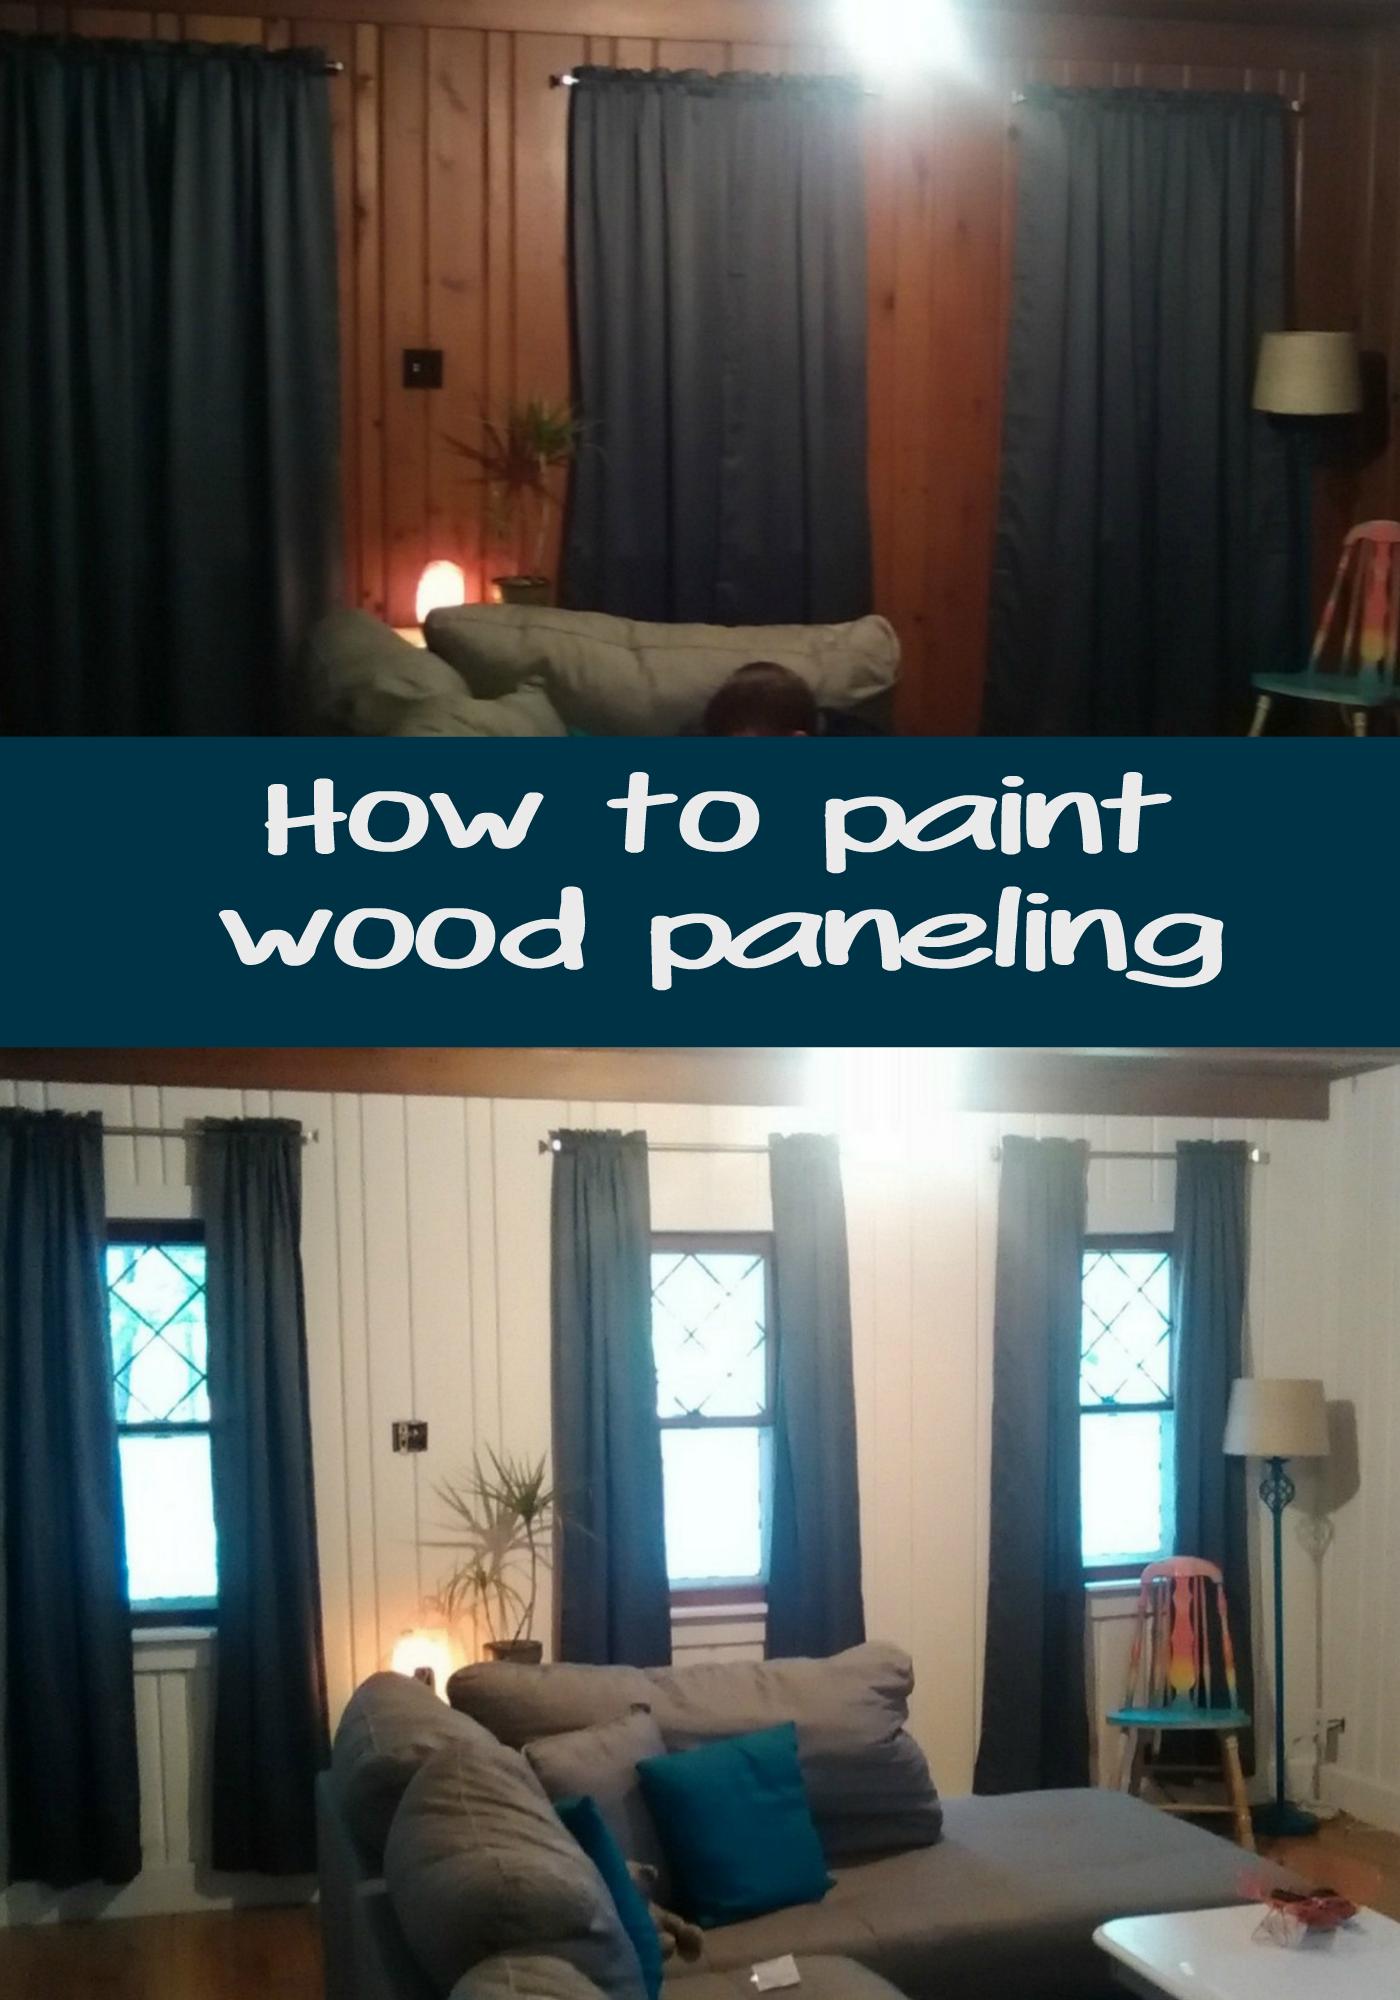 Basement Wood Paneling: How To Paint Wood Paneling. DIY Painting Wood Paneling